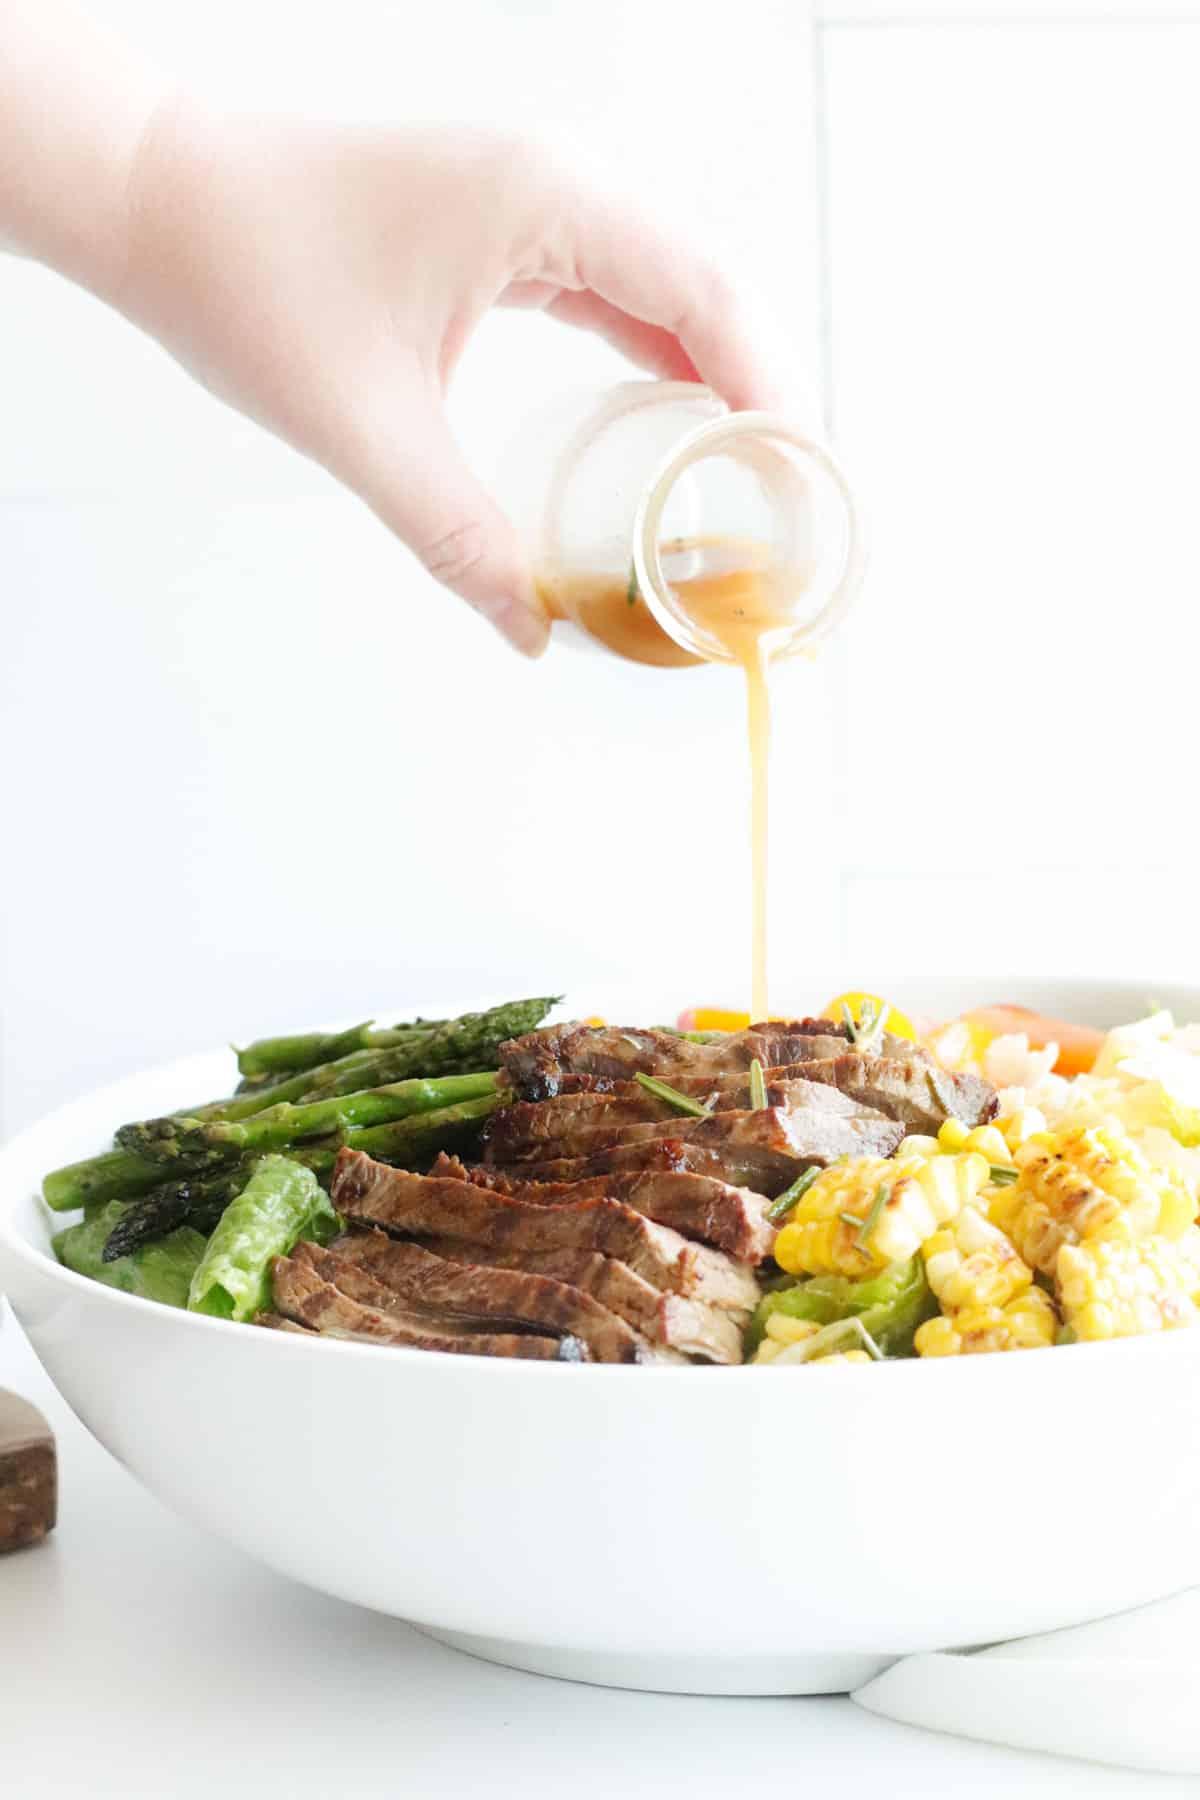 pouring salad dressing over a bowl of steak salad